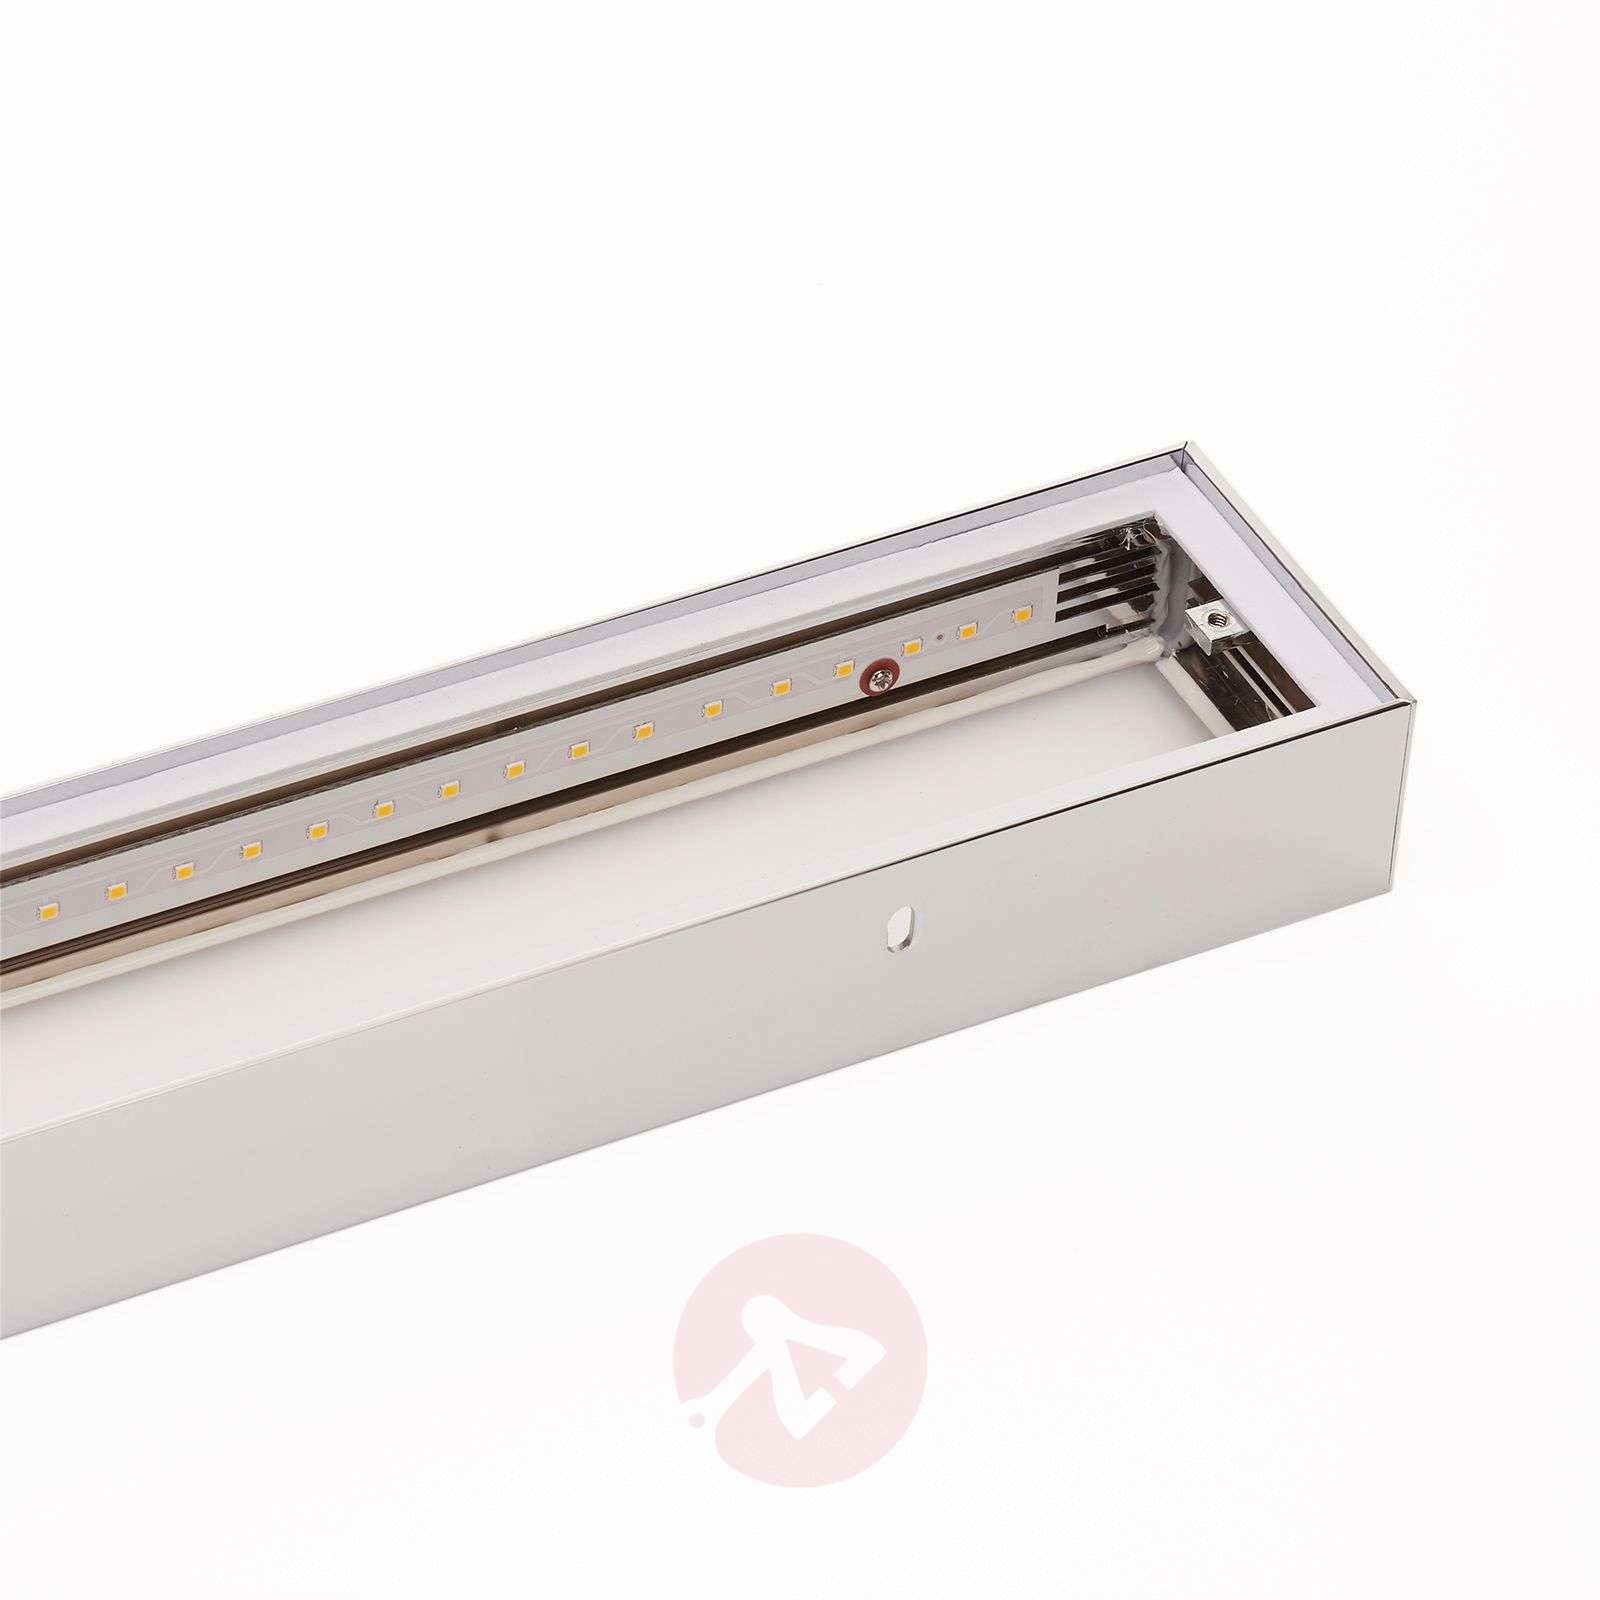 Helestra Theia LED mirror light chrome-plated 60cm-4516461-01